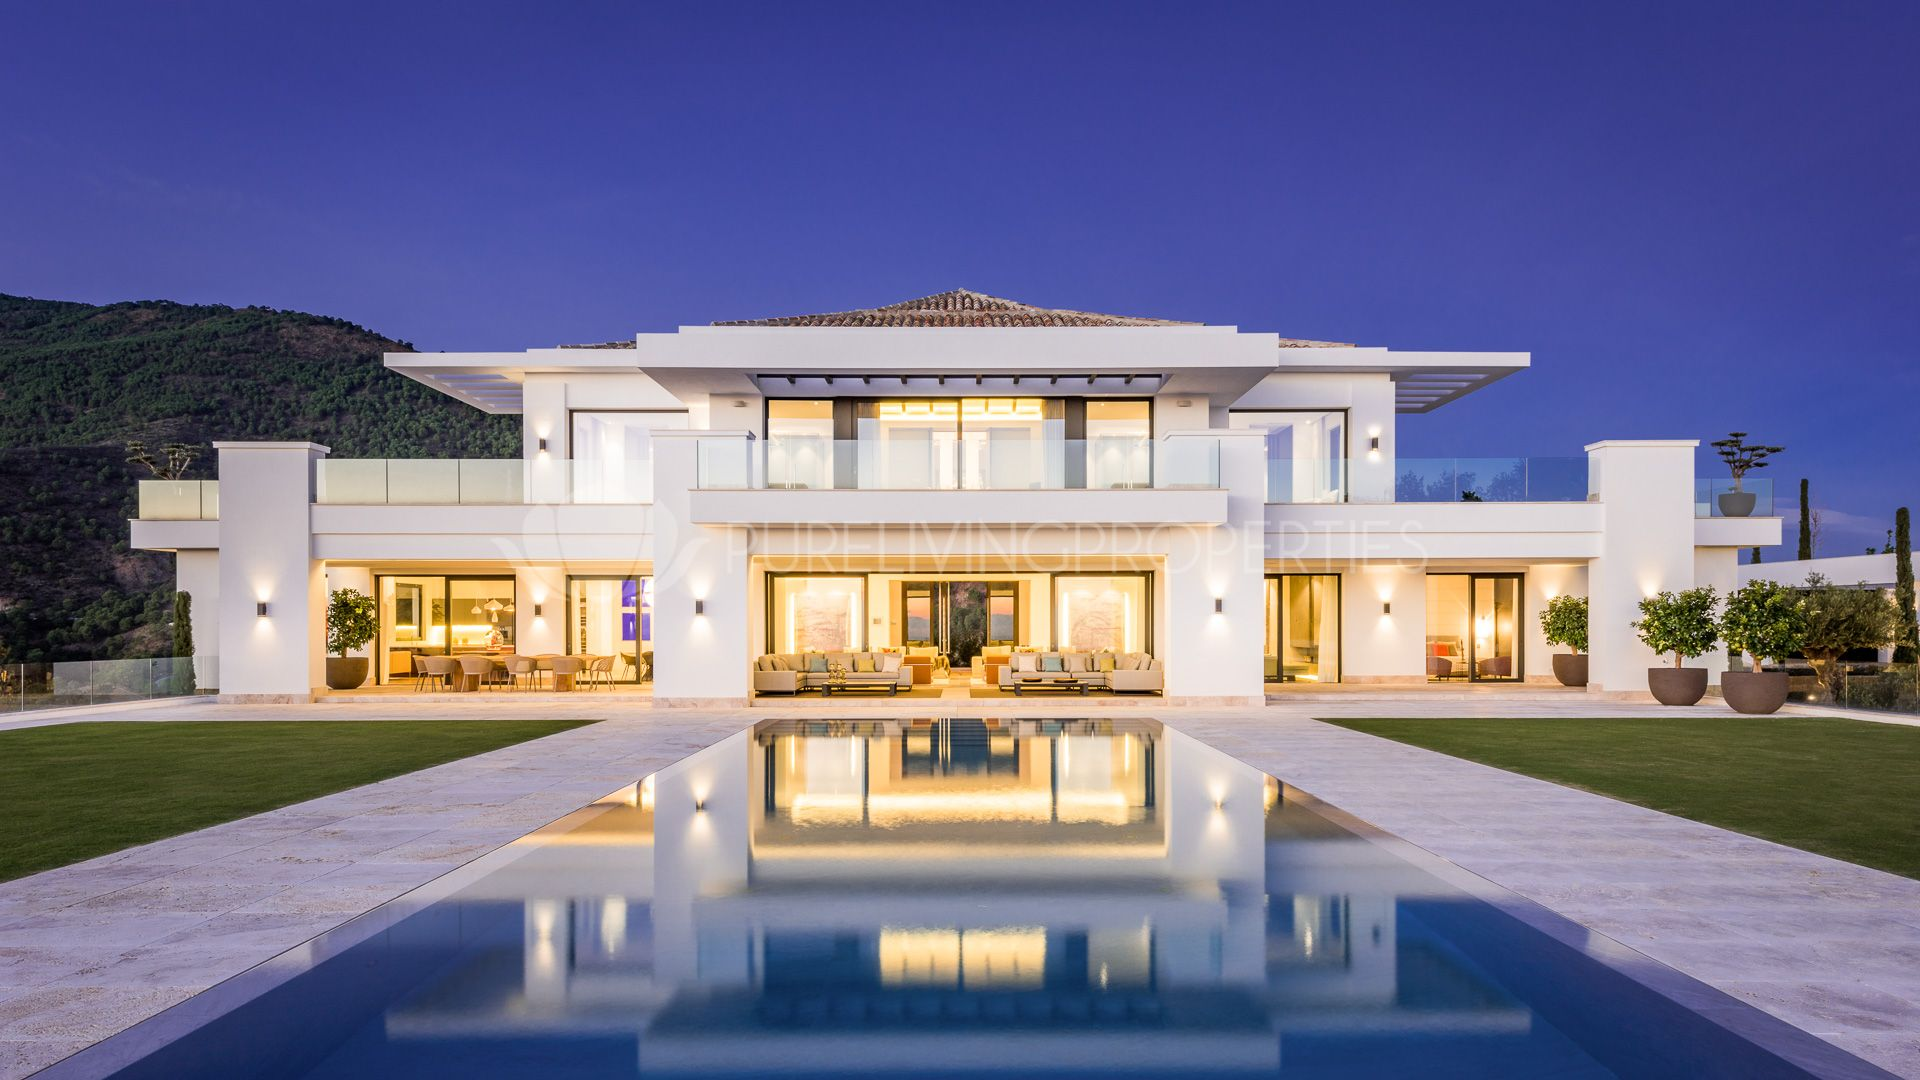 Properties for sale in marbella real estate in puente romano - Luxury homes marbella ...